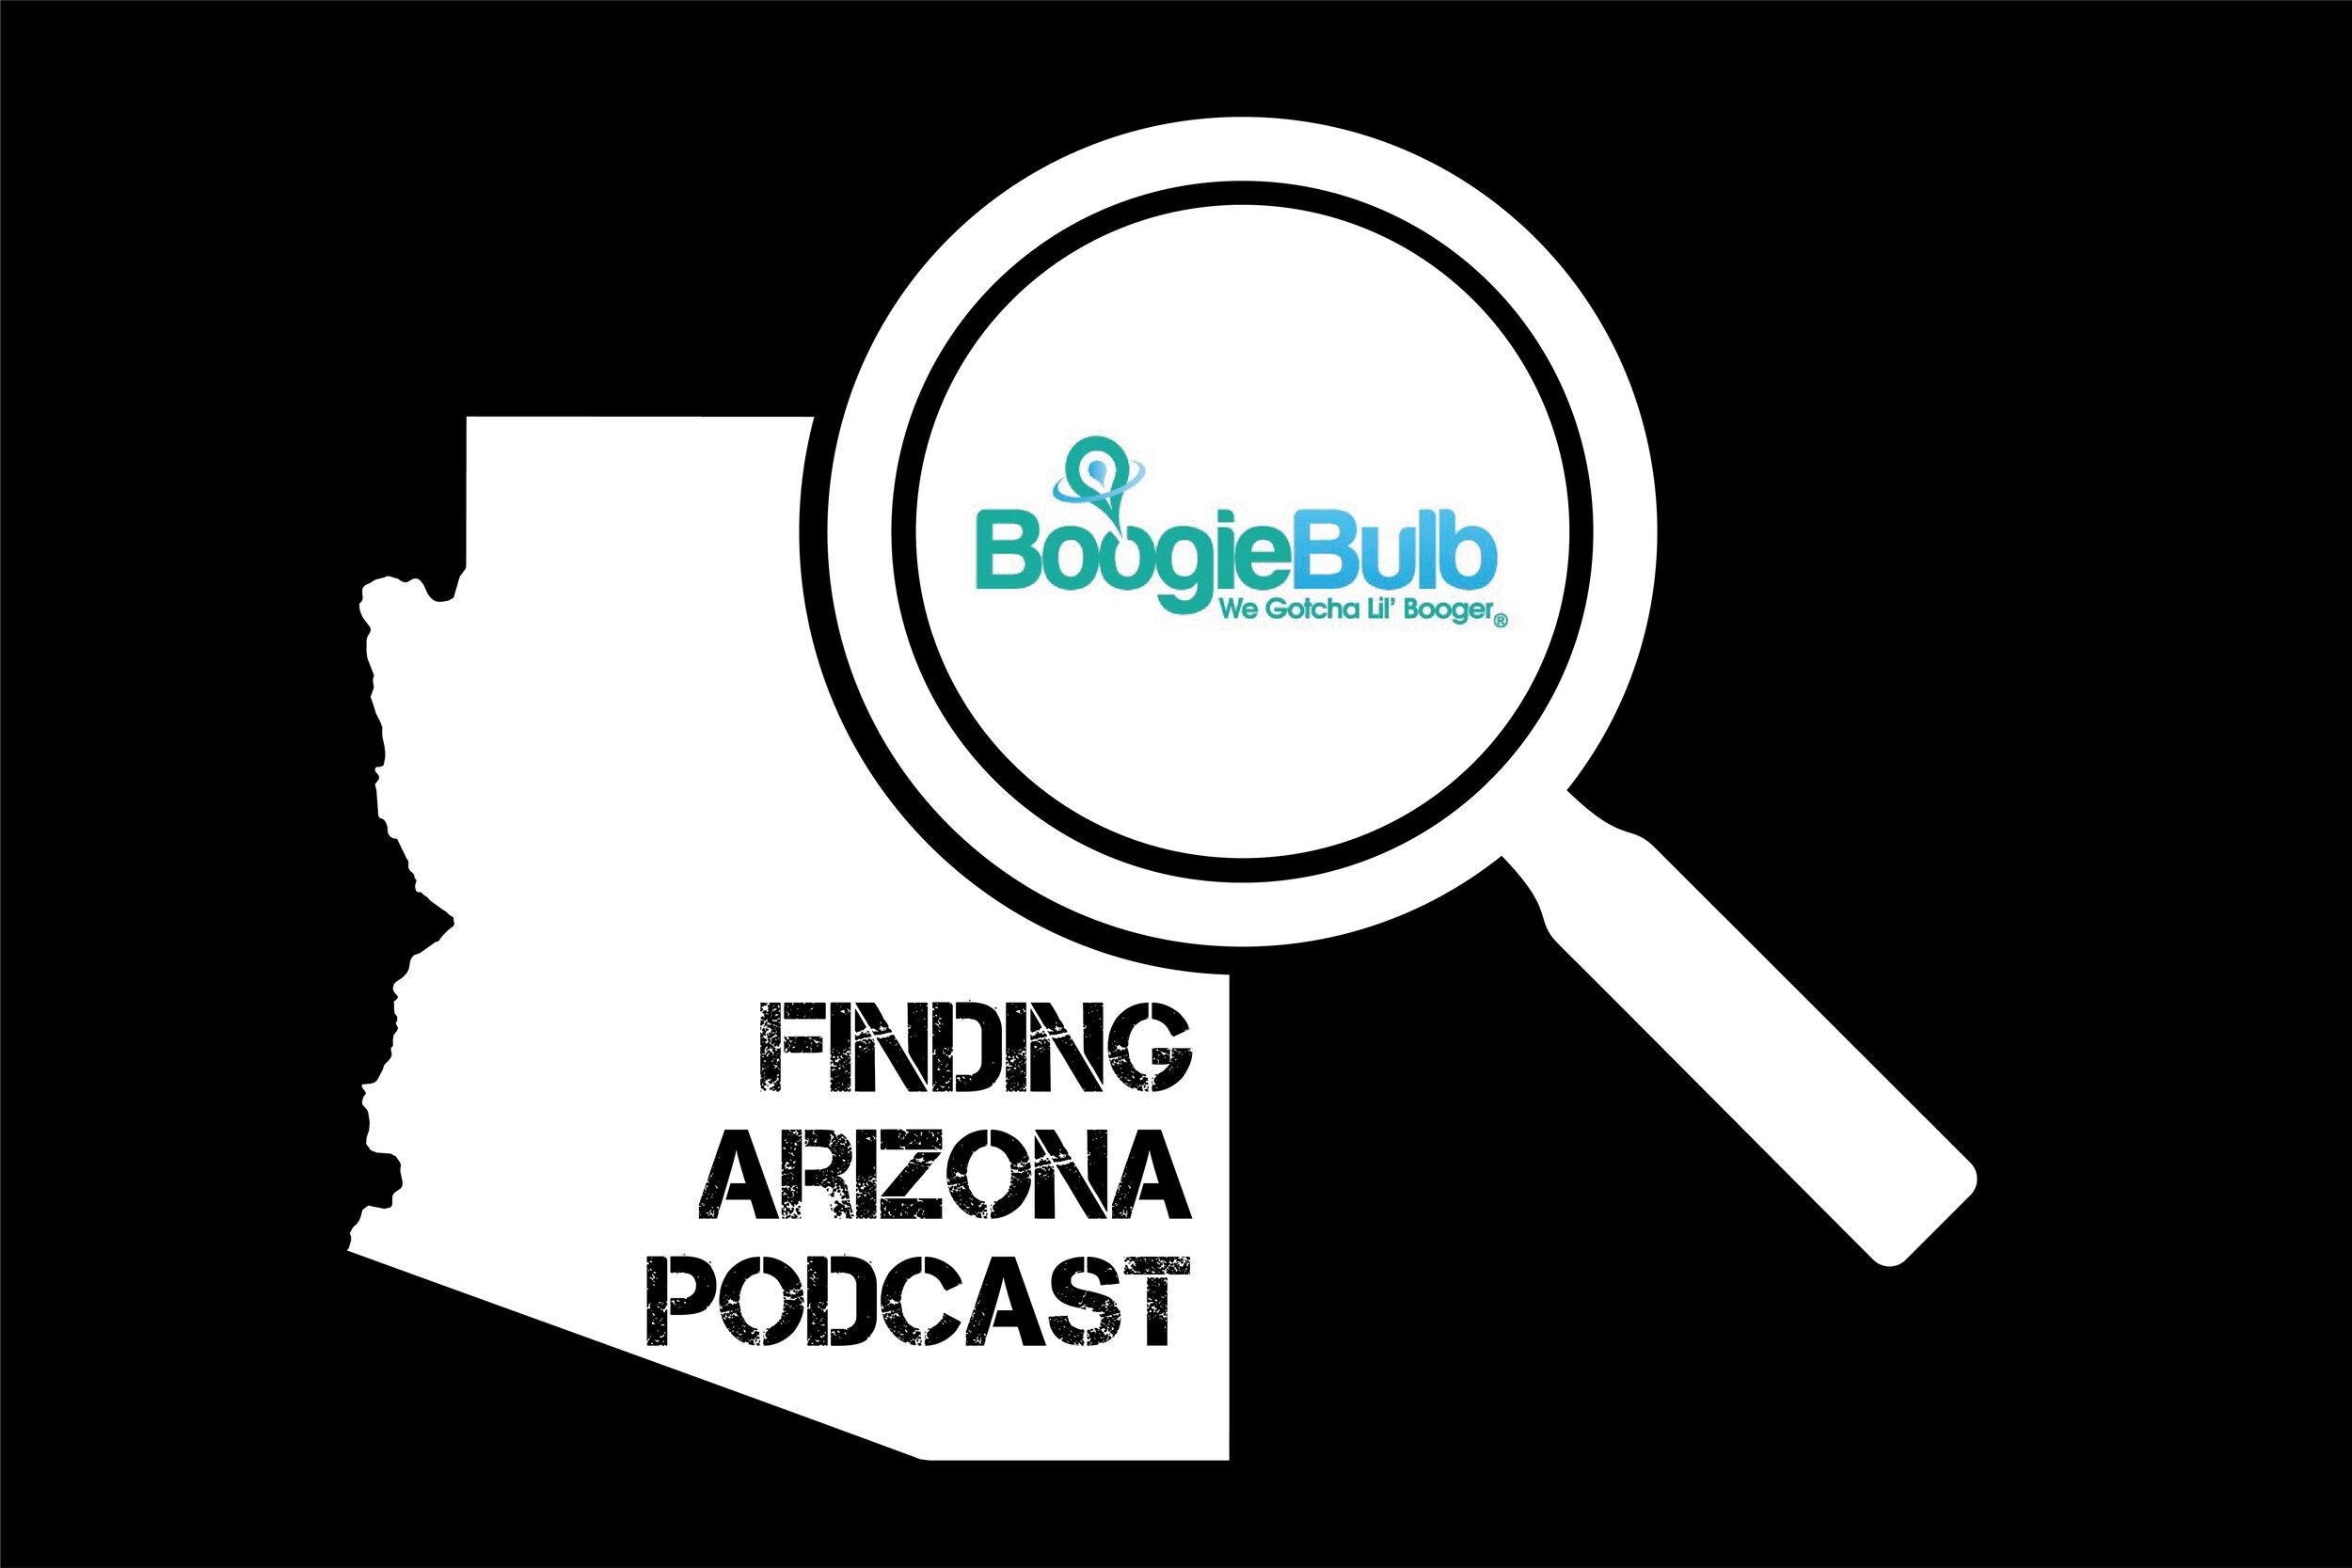 PodCastLogo-BoogieBulb.jpg